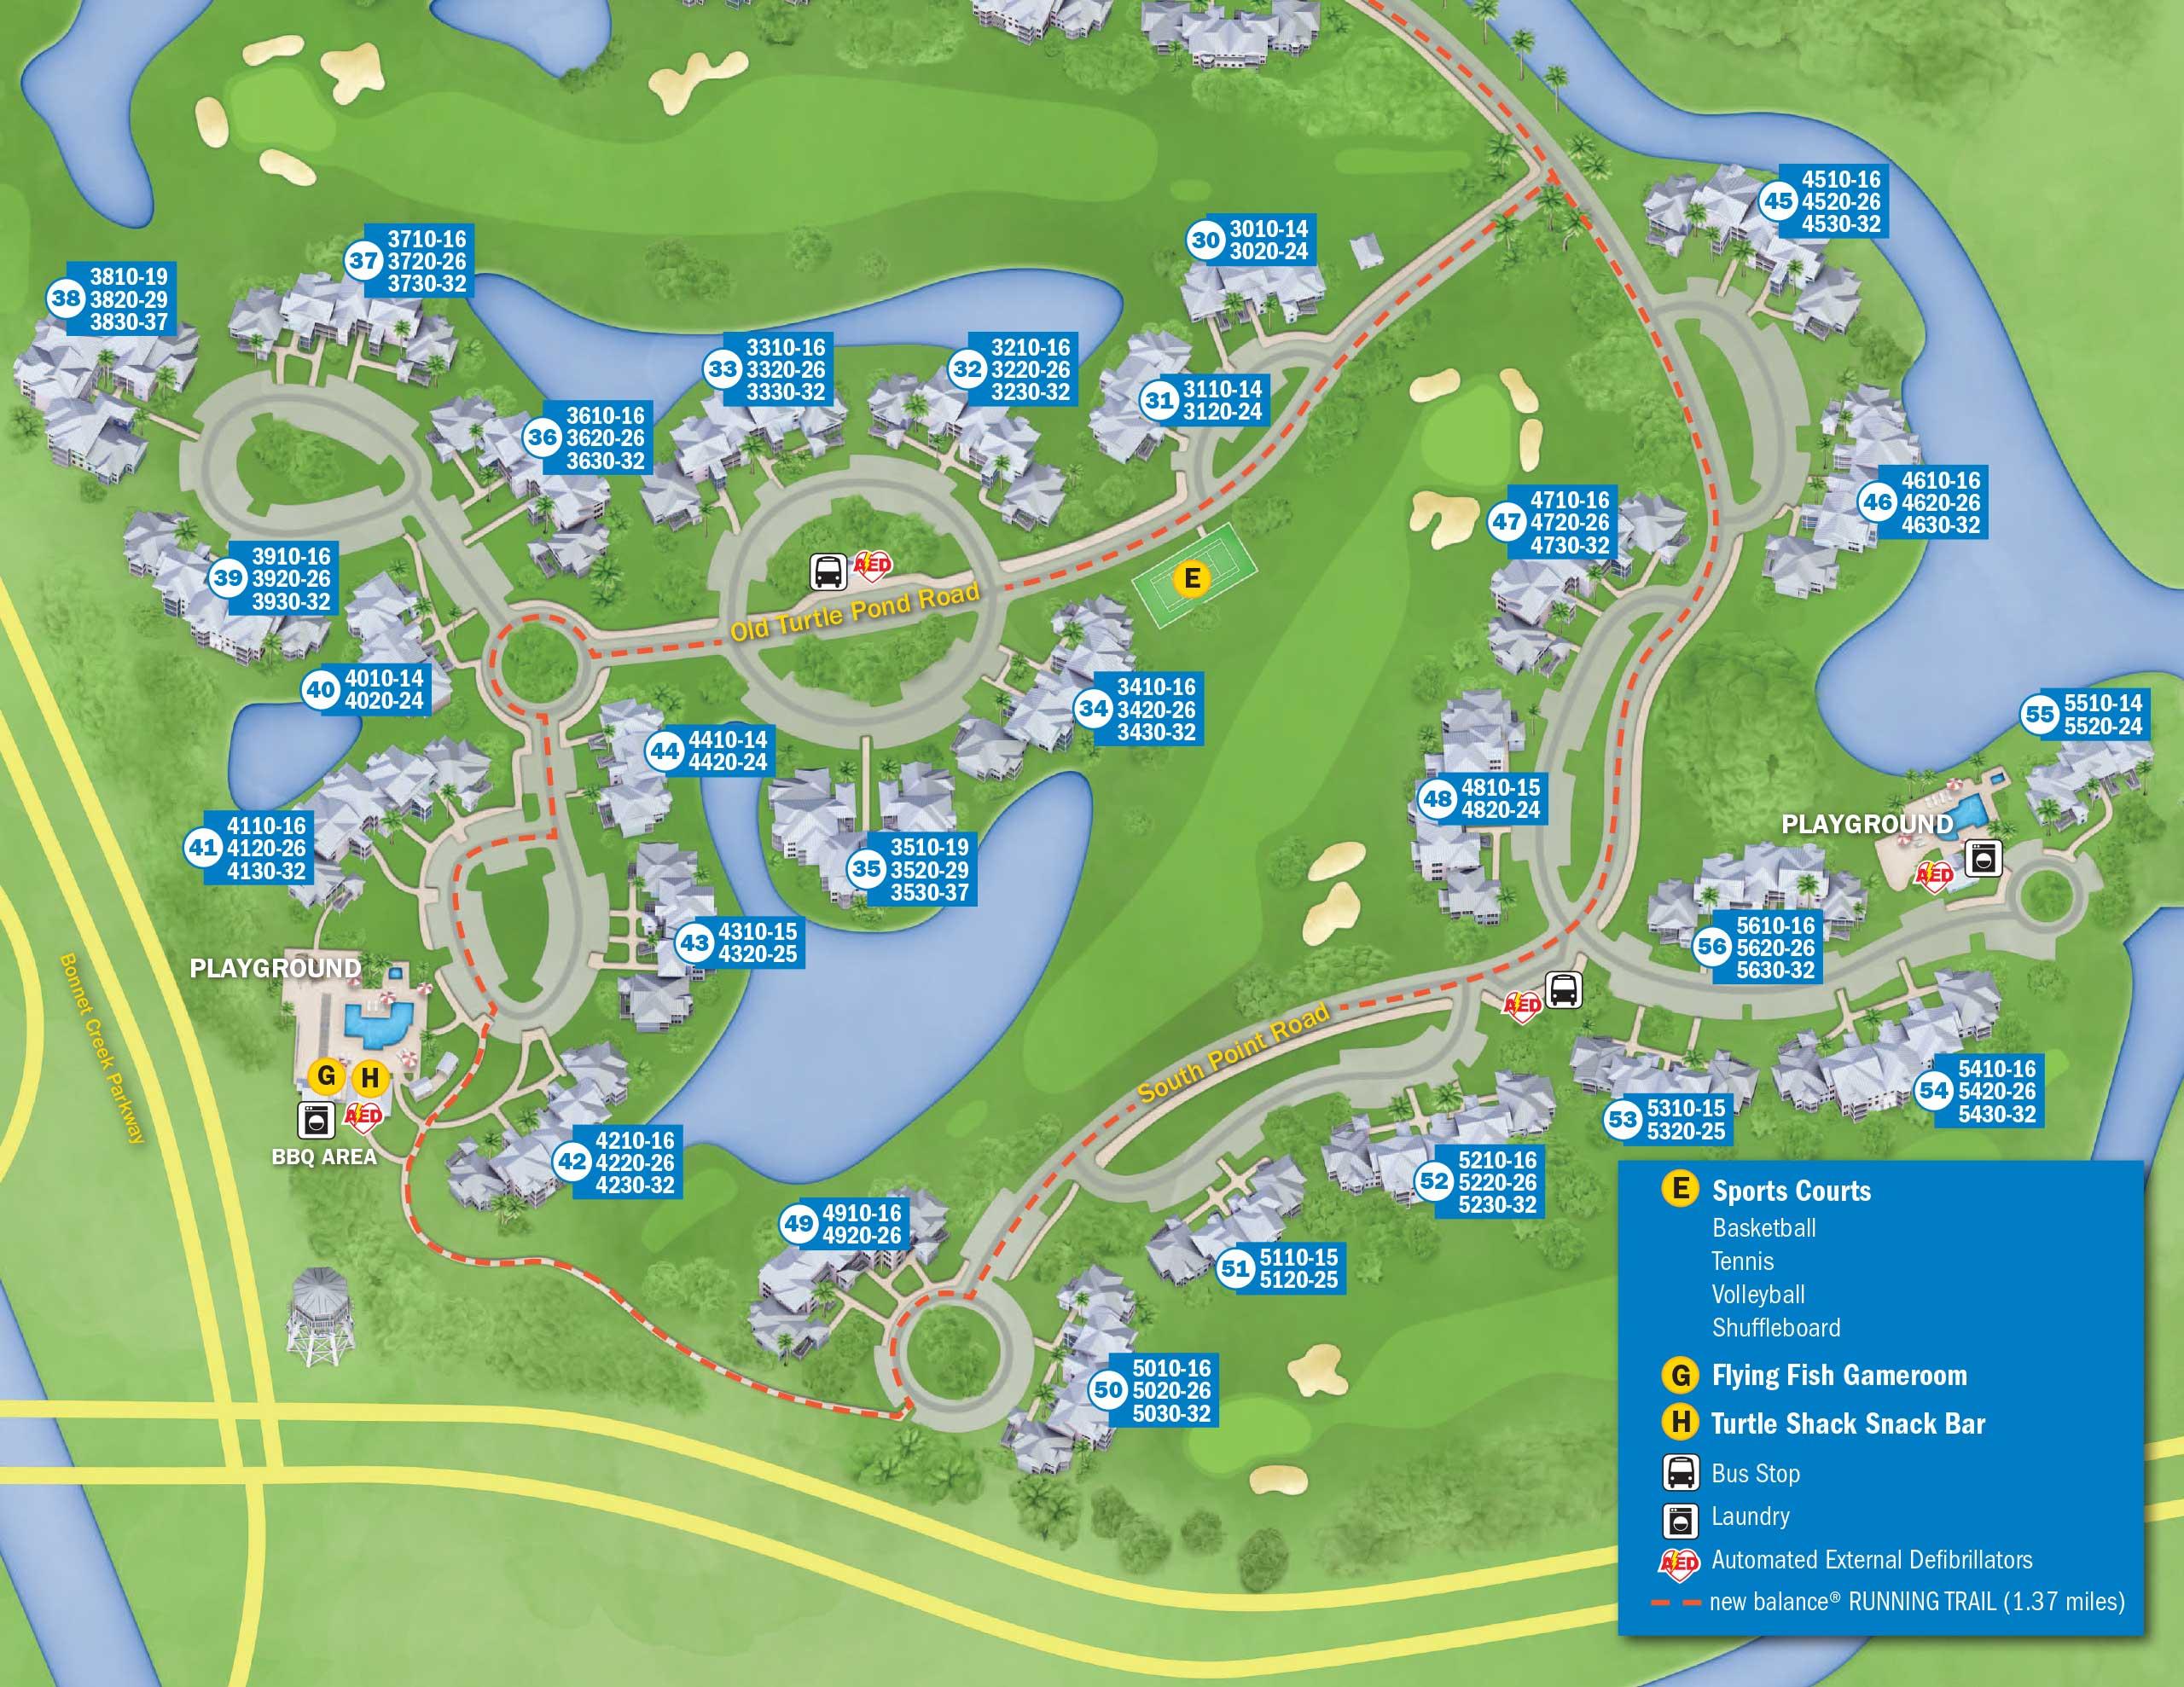 Walt Disney World Map With Hotels.April 2017 Walt Disney World Resort Hotel Maps Photo 28 Of 33